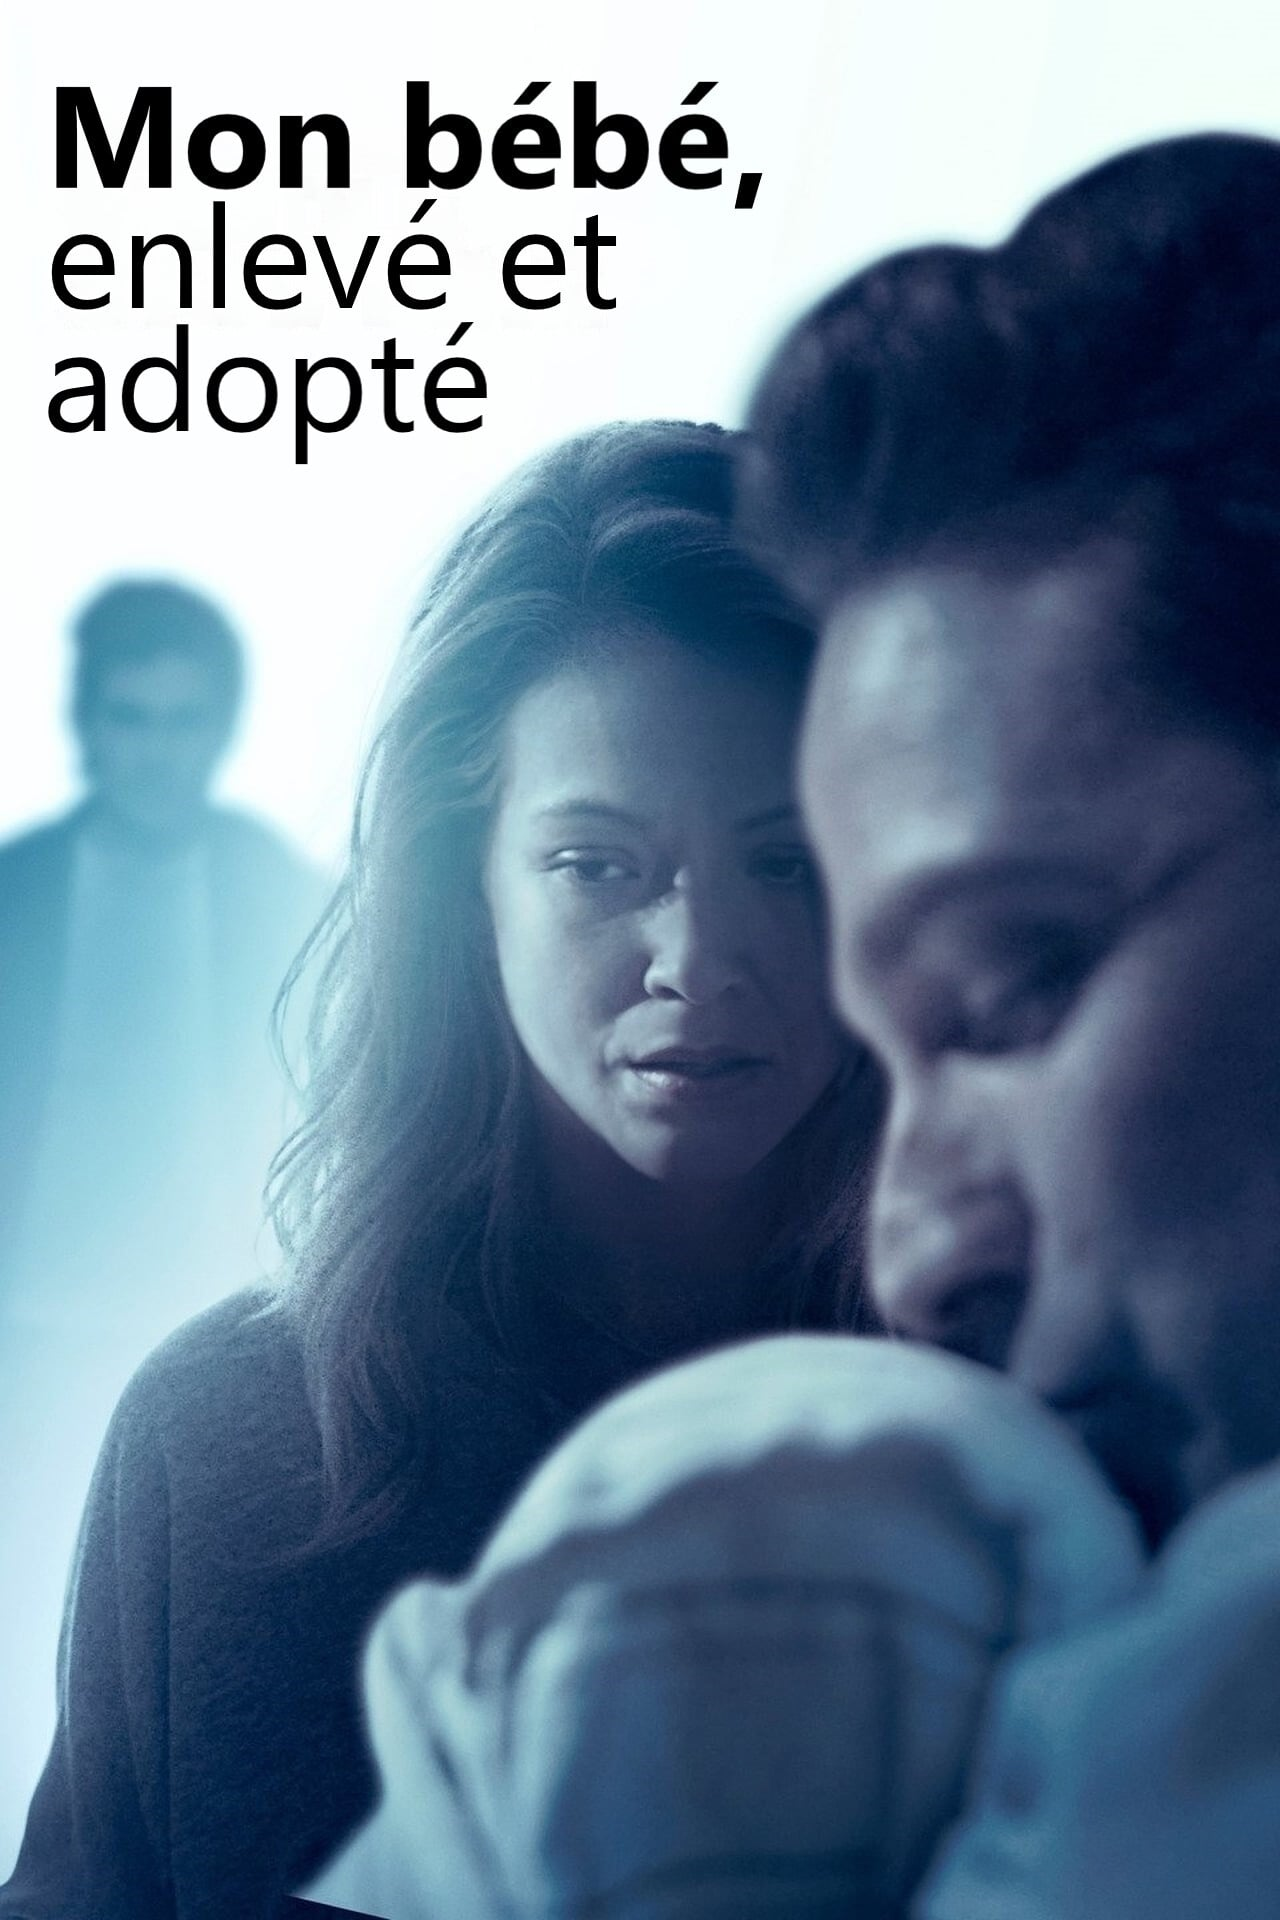 mon bebe enleve et adopte film 2017